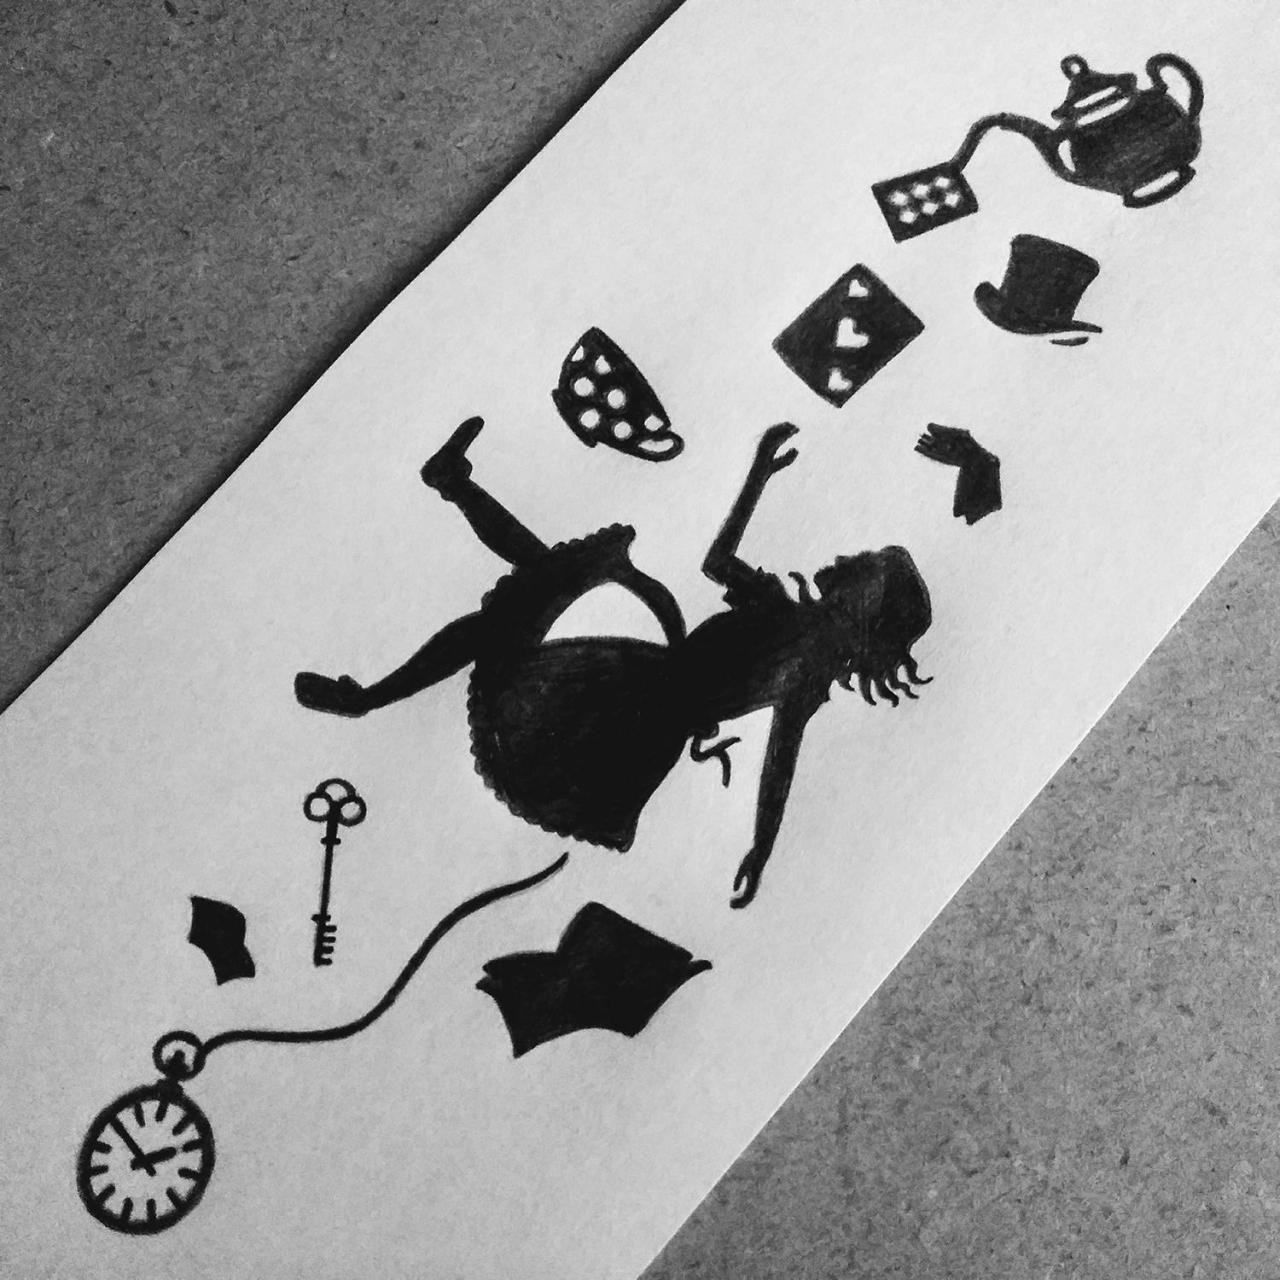 Alice in Wonderland silhouette tattoo design I made